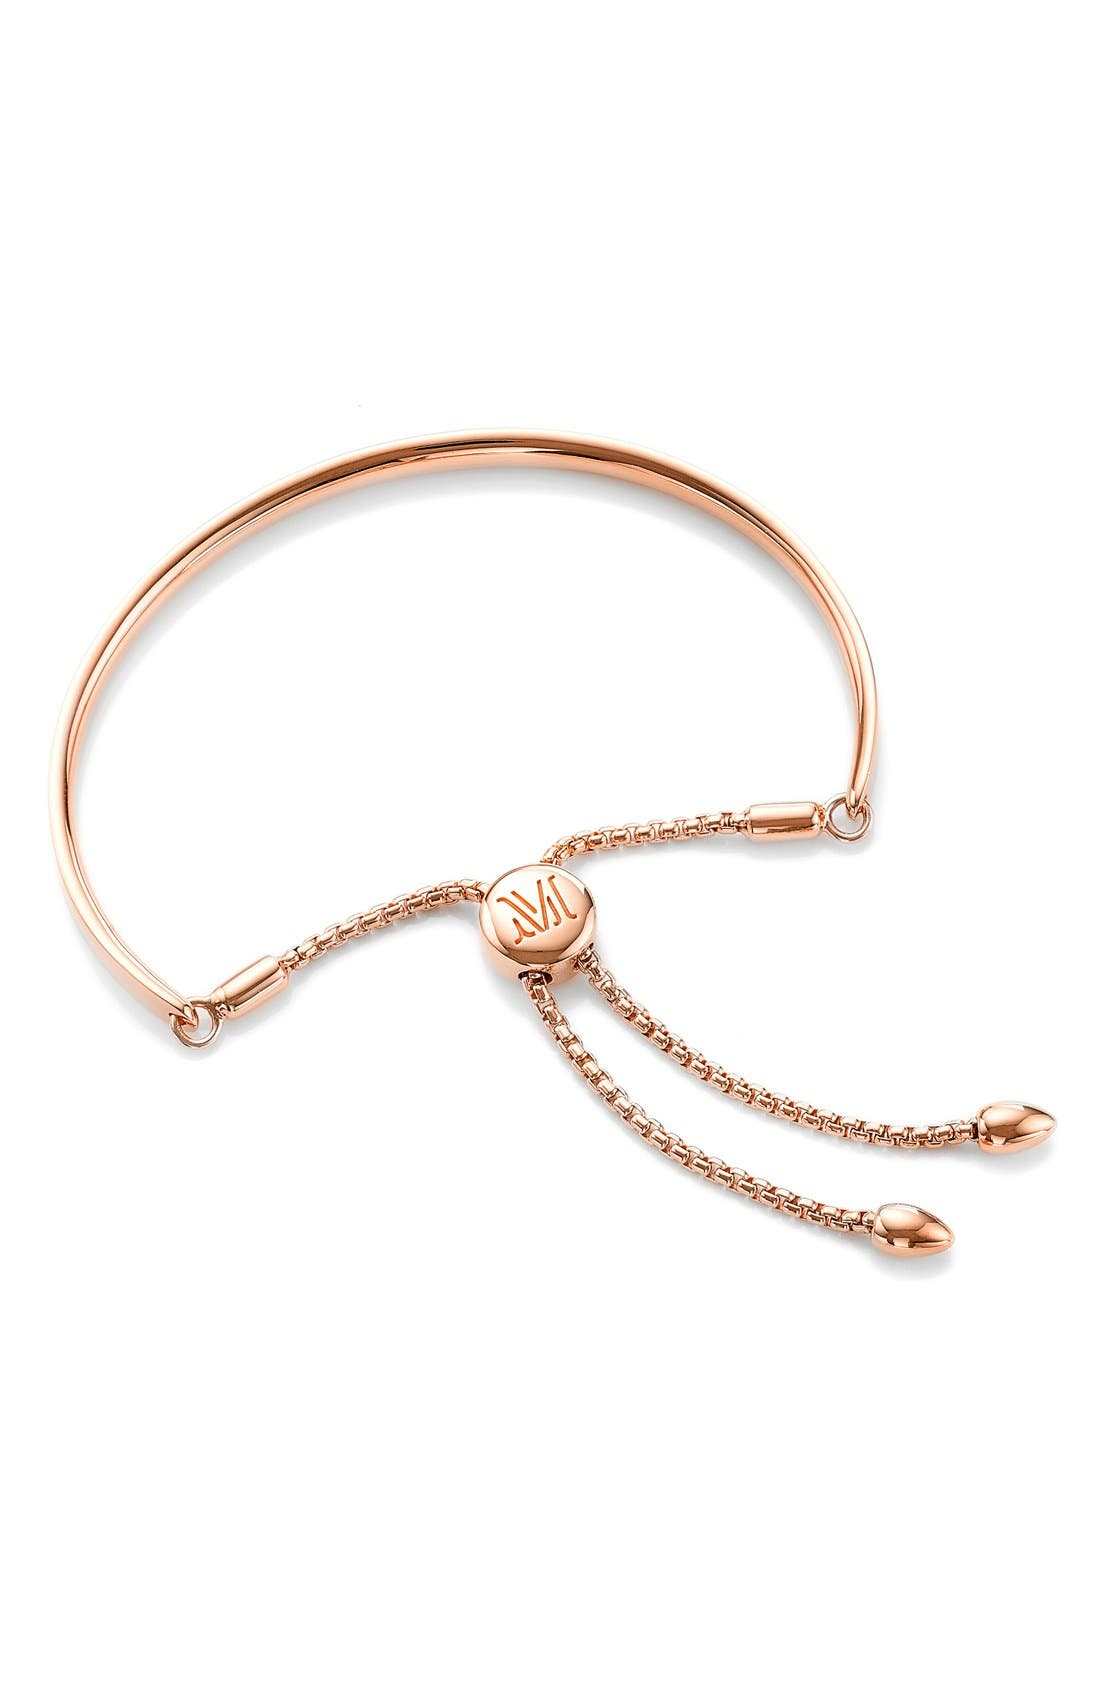 MONICA VINADER 'Fiji' Chain Bracelet